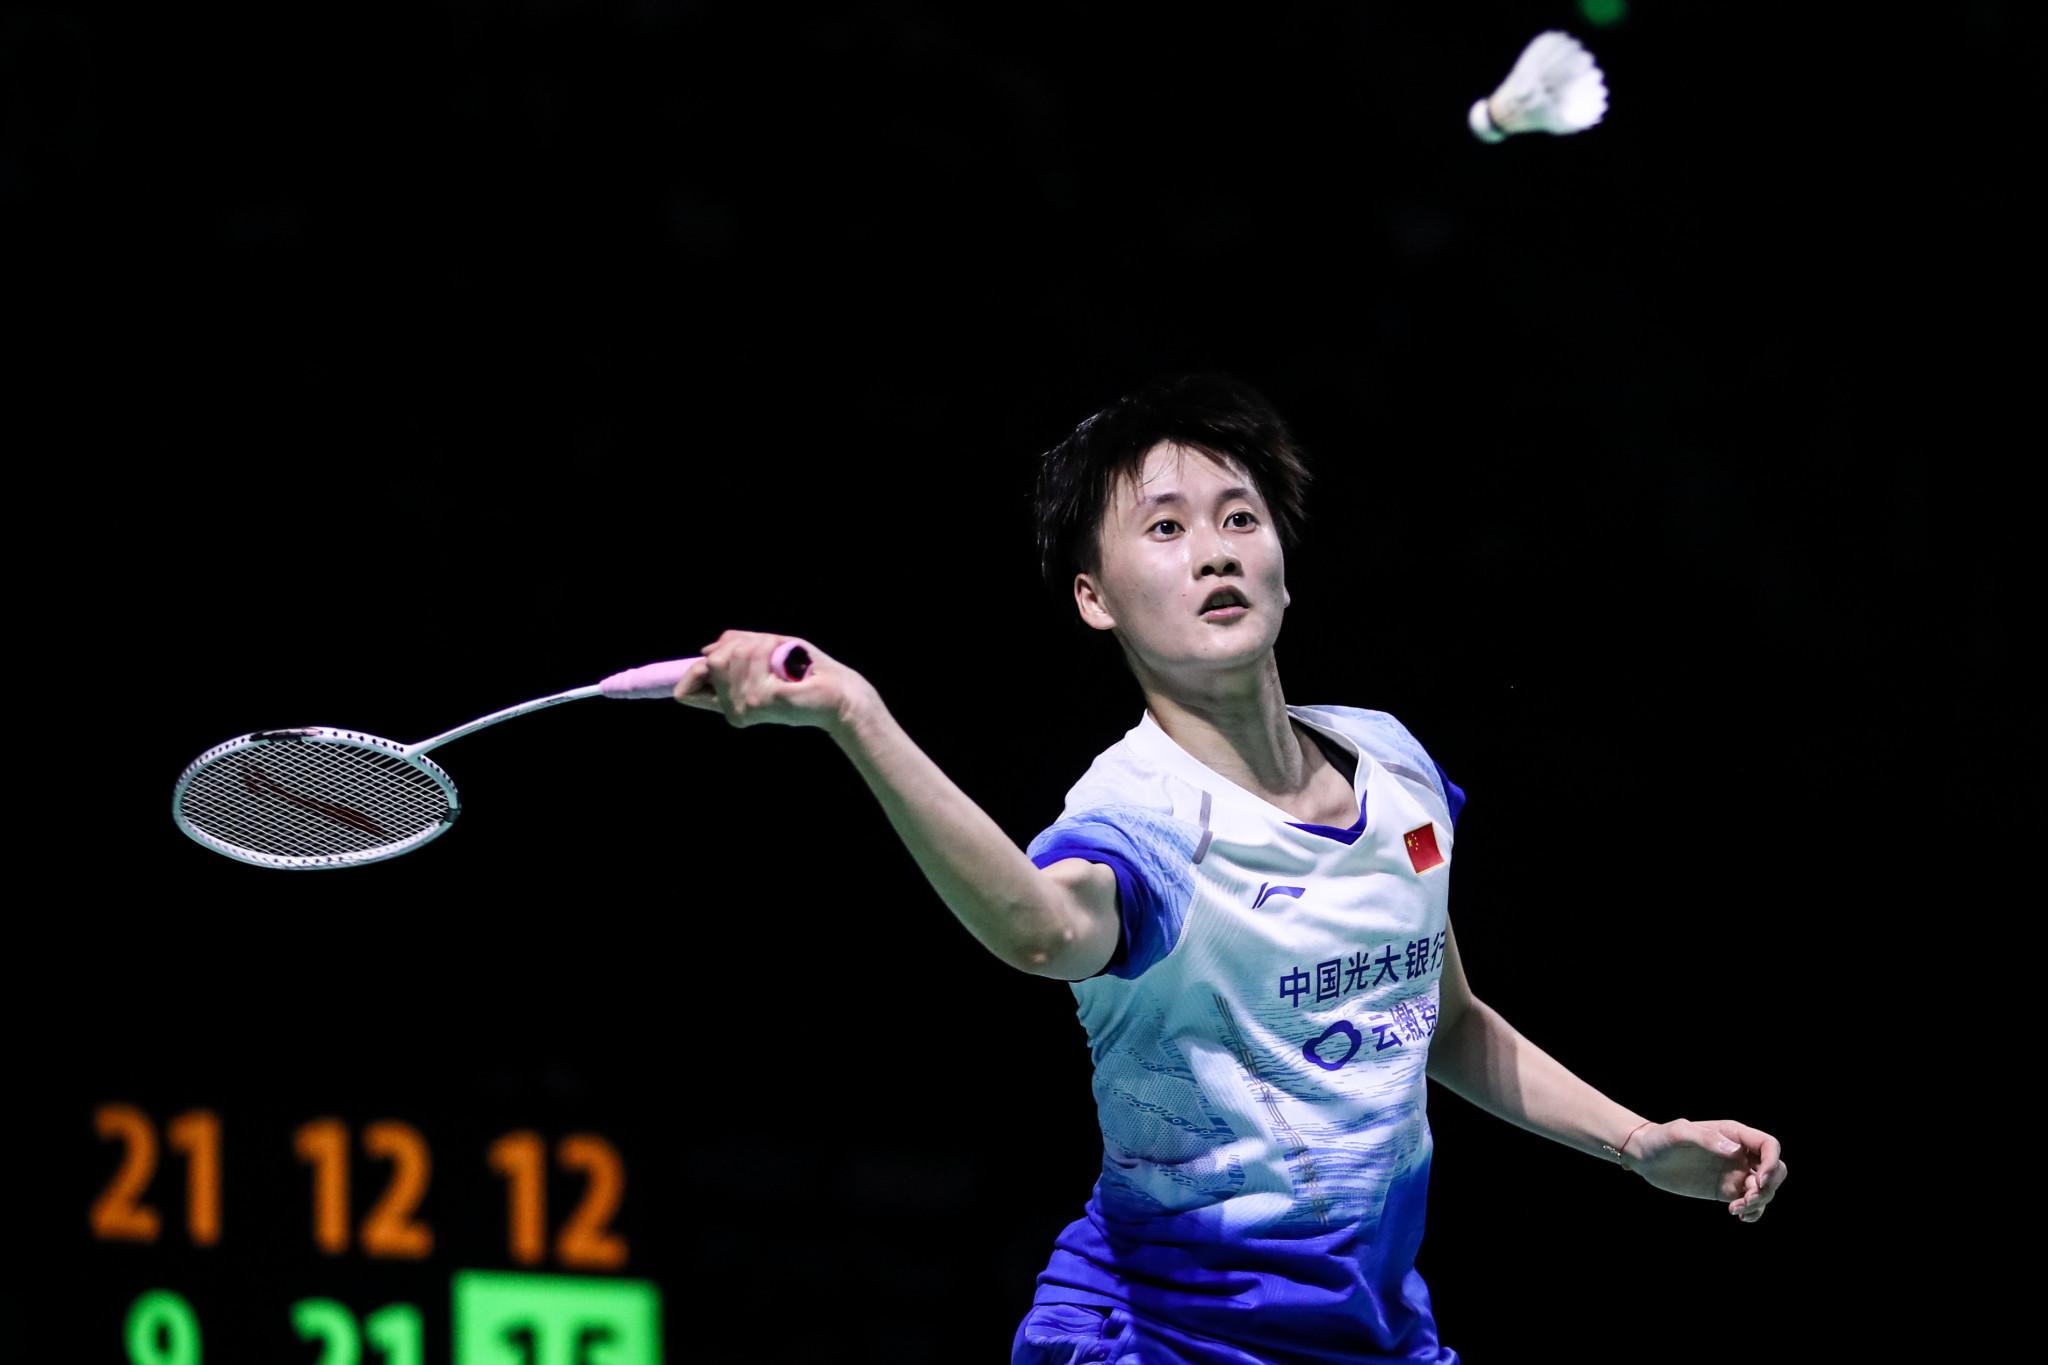 Chen Yufei won the women's title in Hong Kong ©Getty Images